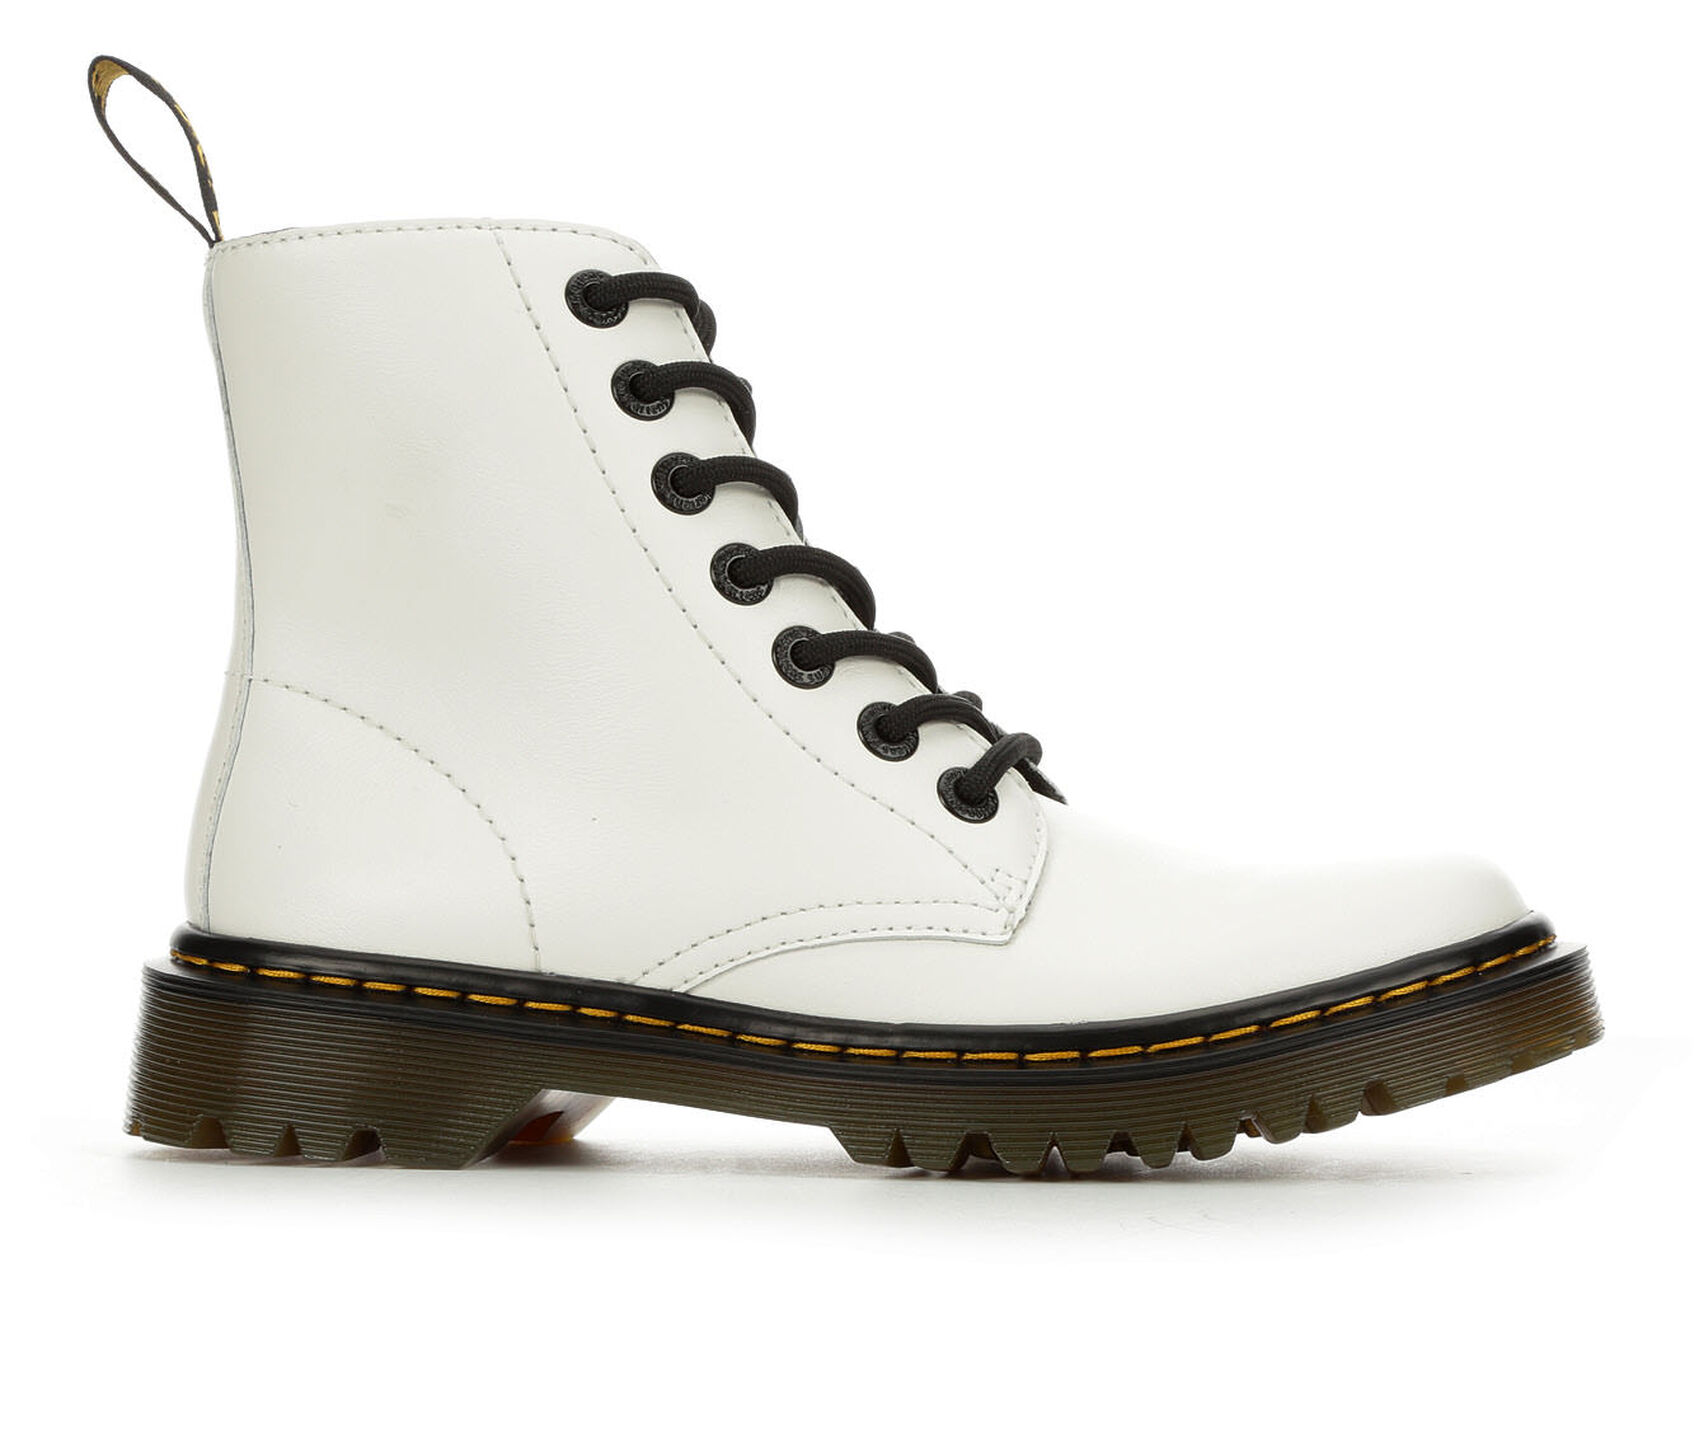 a678c2ad1ef88 Women's Dr. Martens Luana 6 Eye Combat Boots | Shoe Carnival